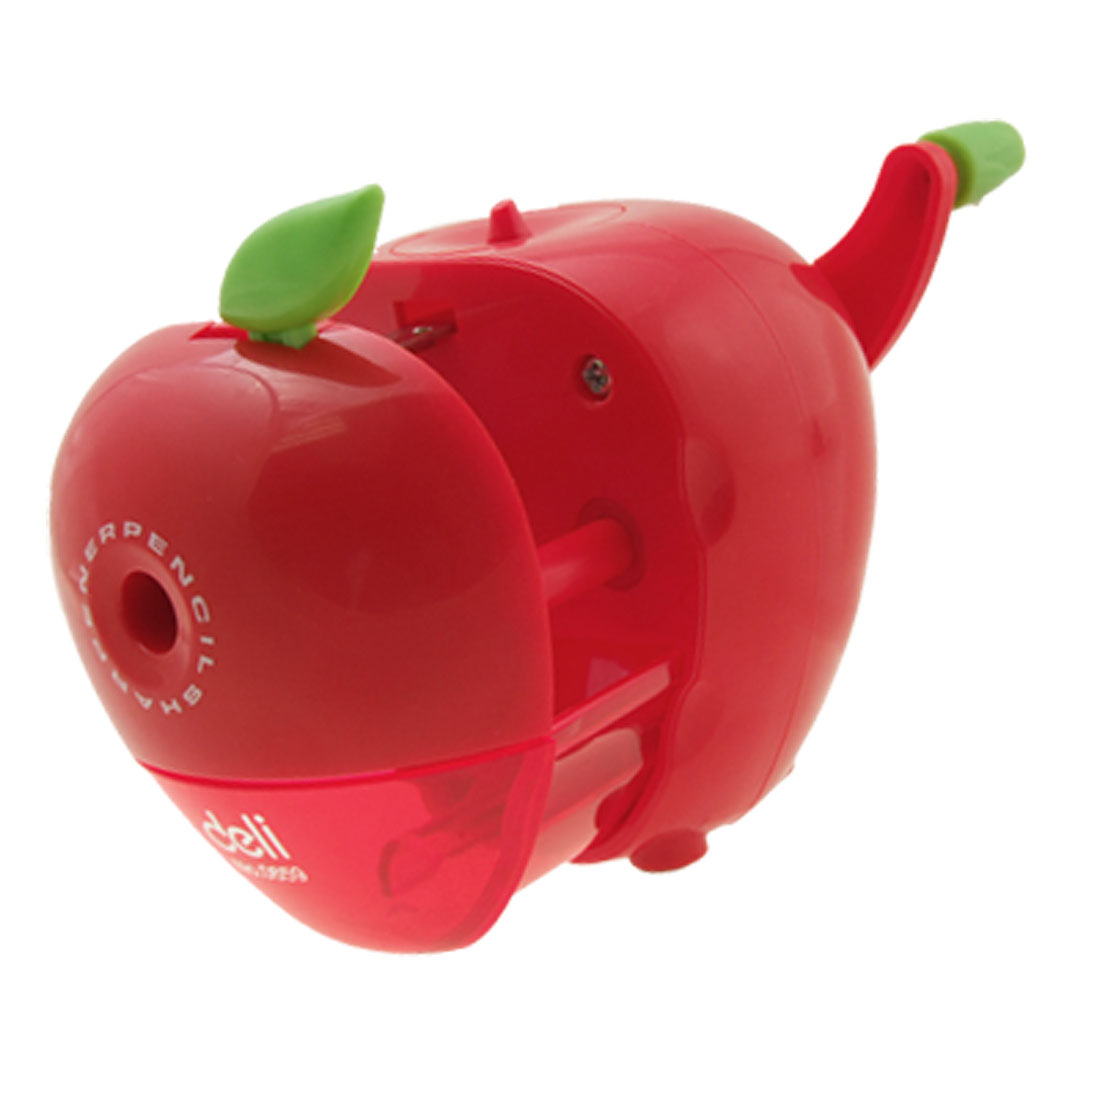 Fashion Cute Like Real Red Apple Plastic Pencil Sharpener